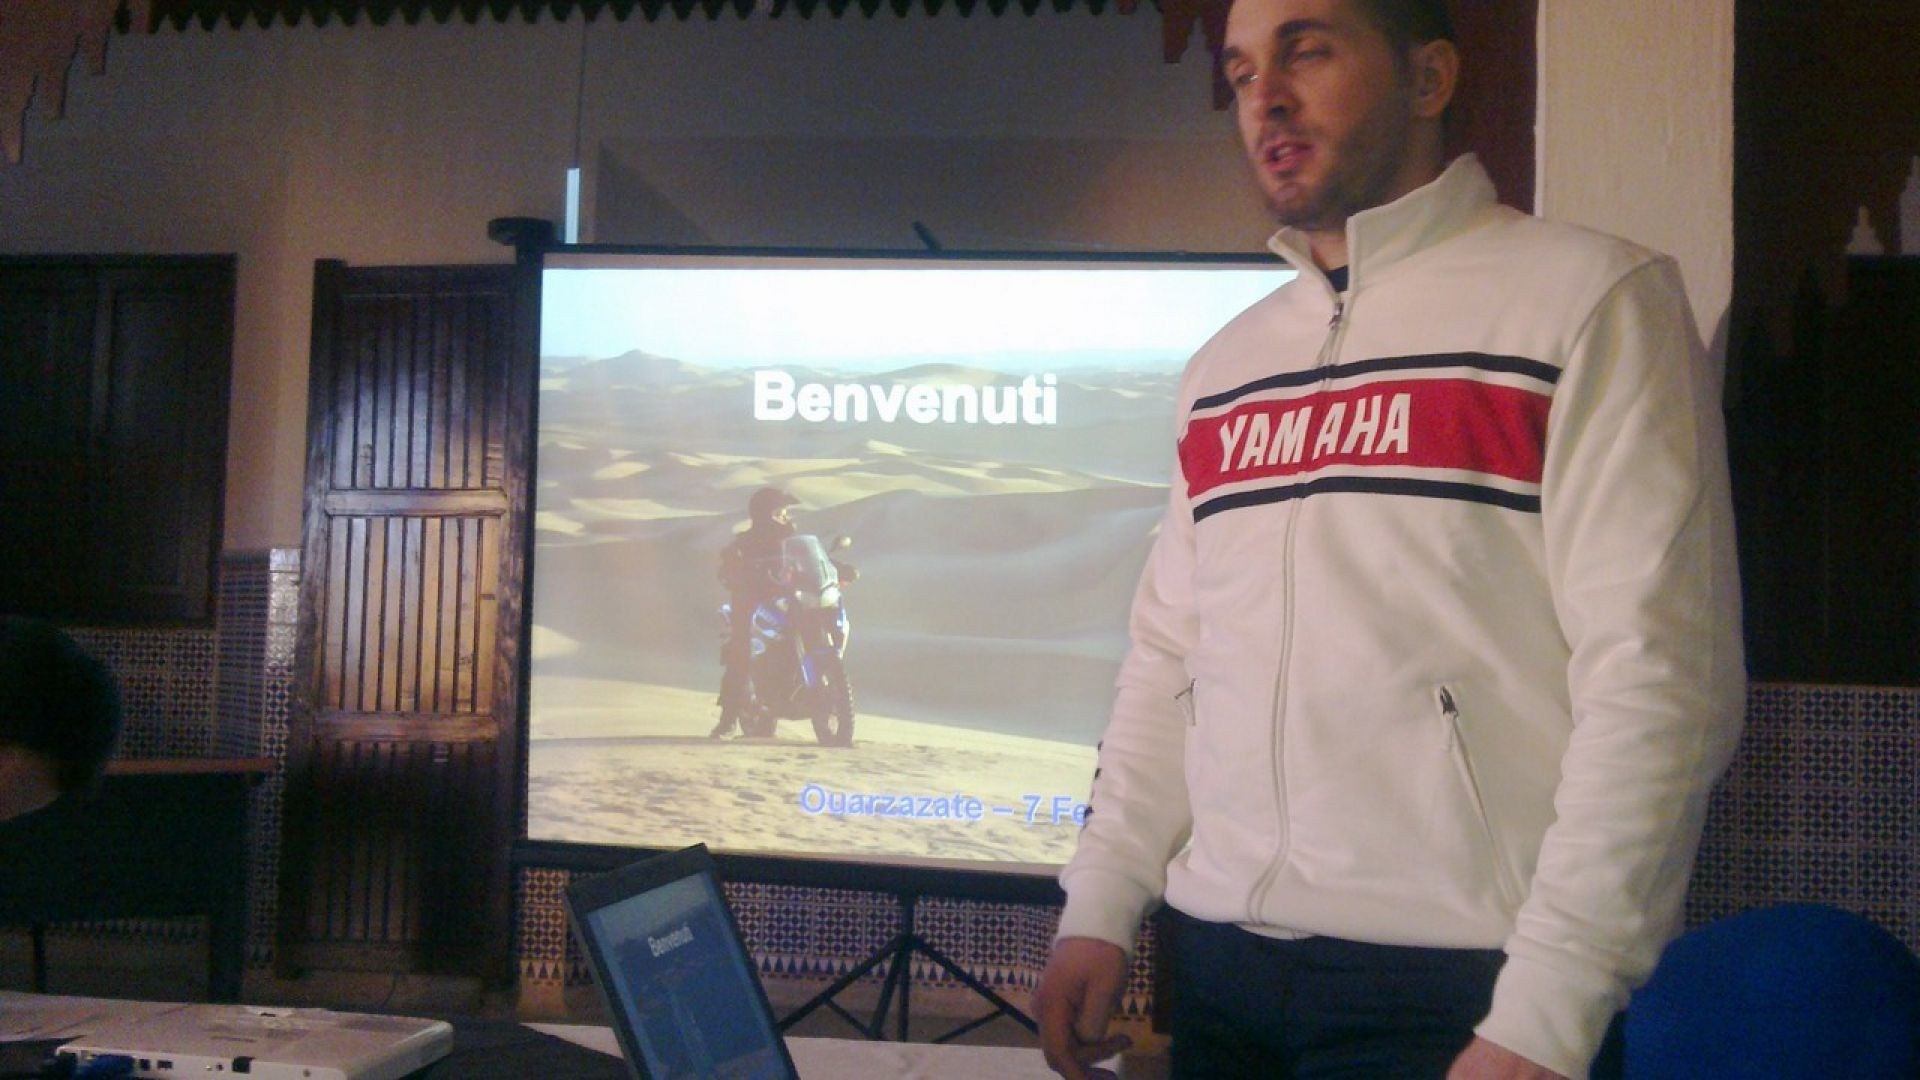 Immagine 162: In Marocco con la Yamaha Super Ténéré